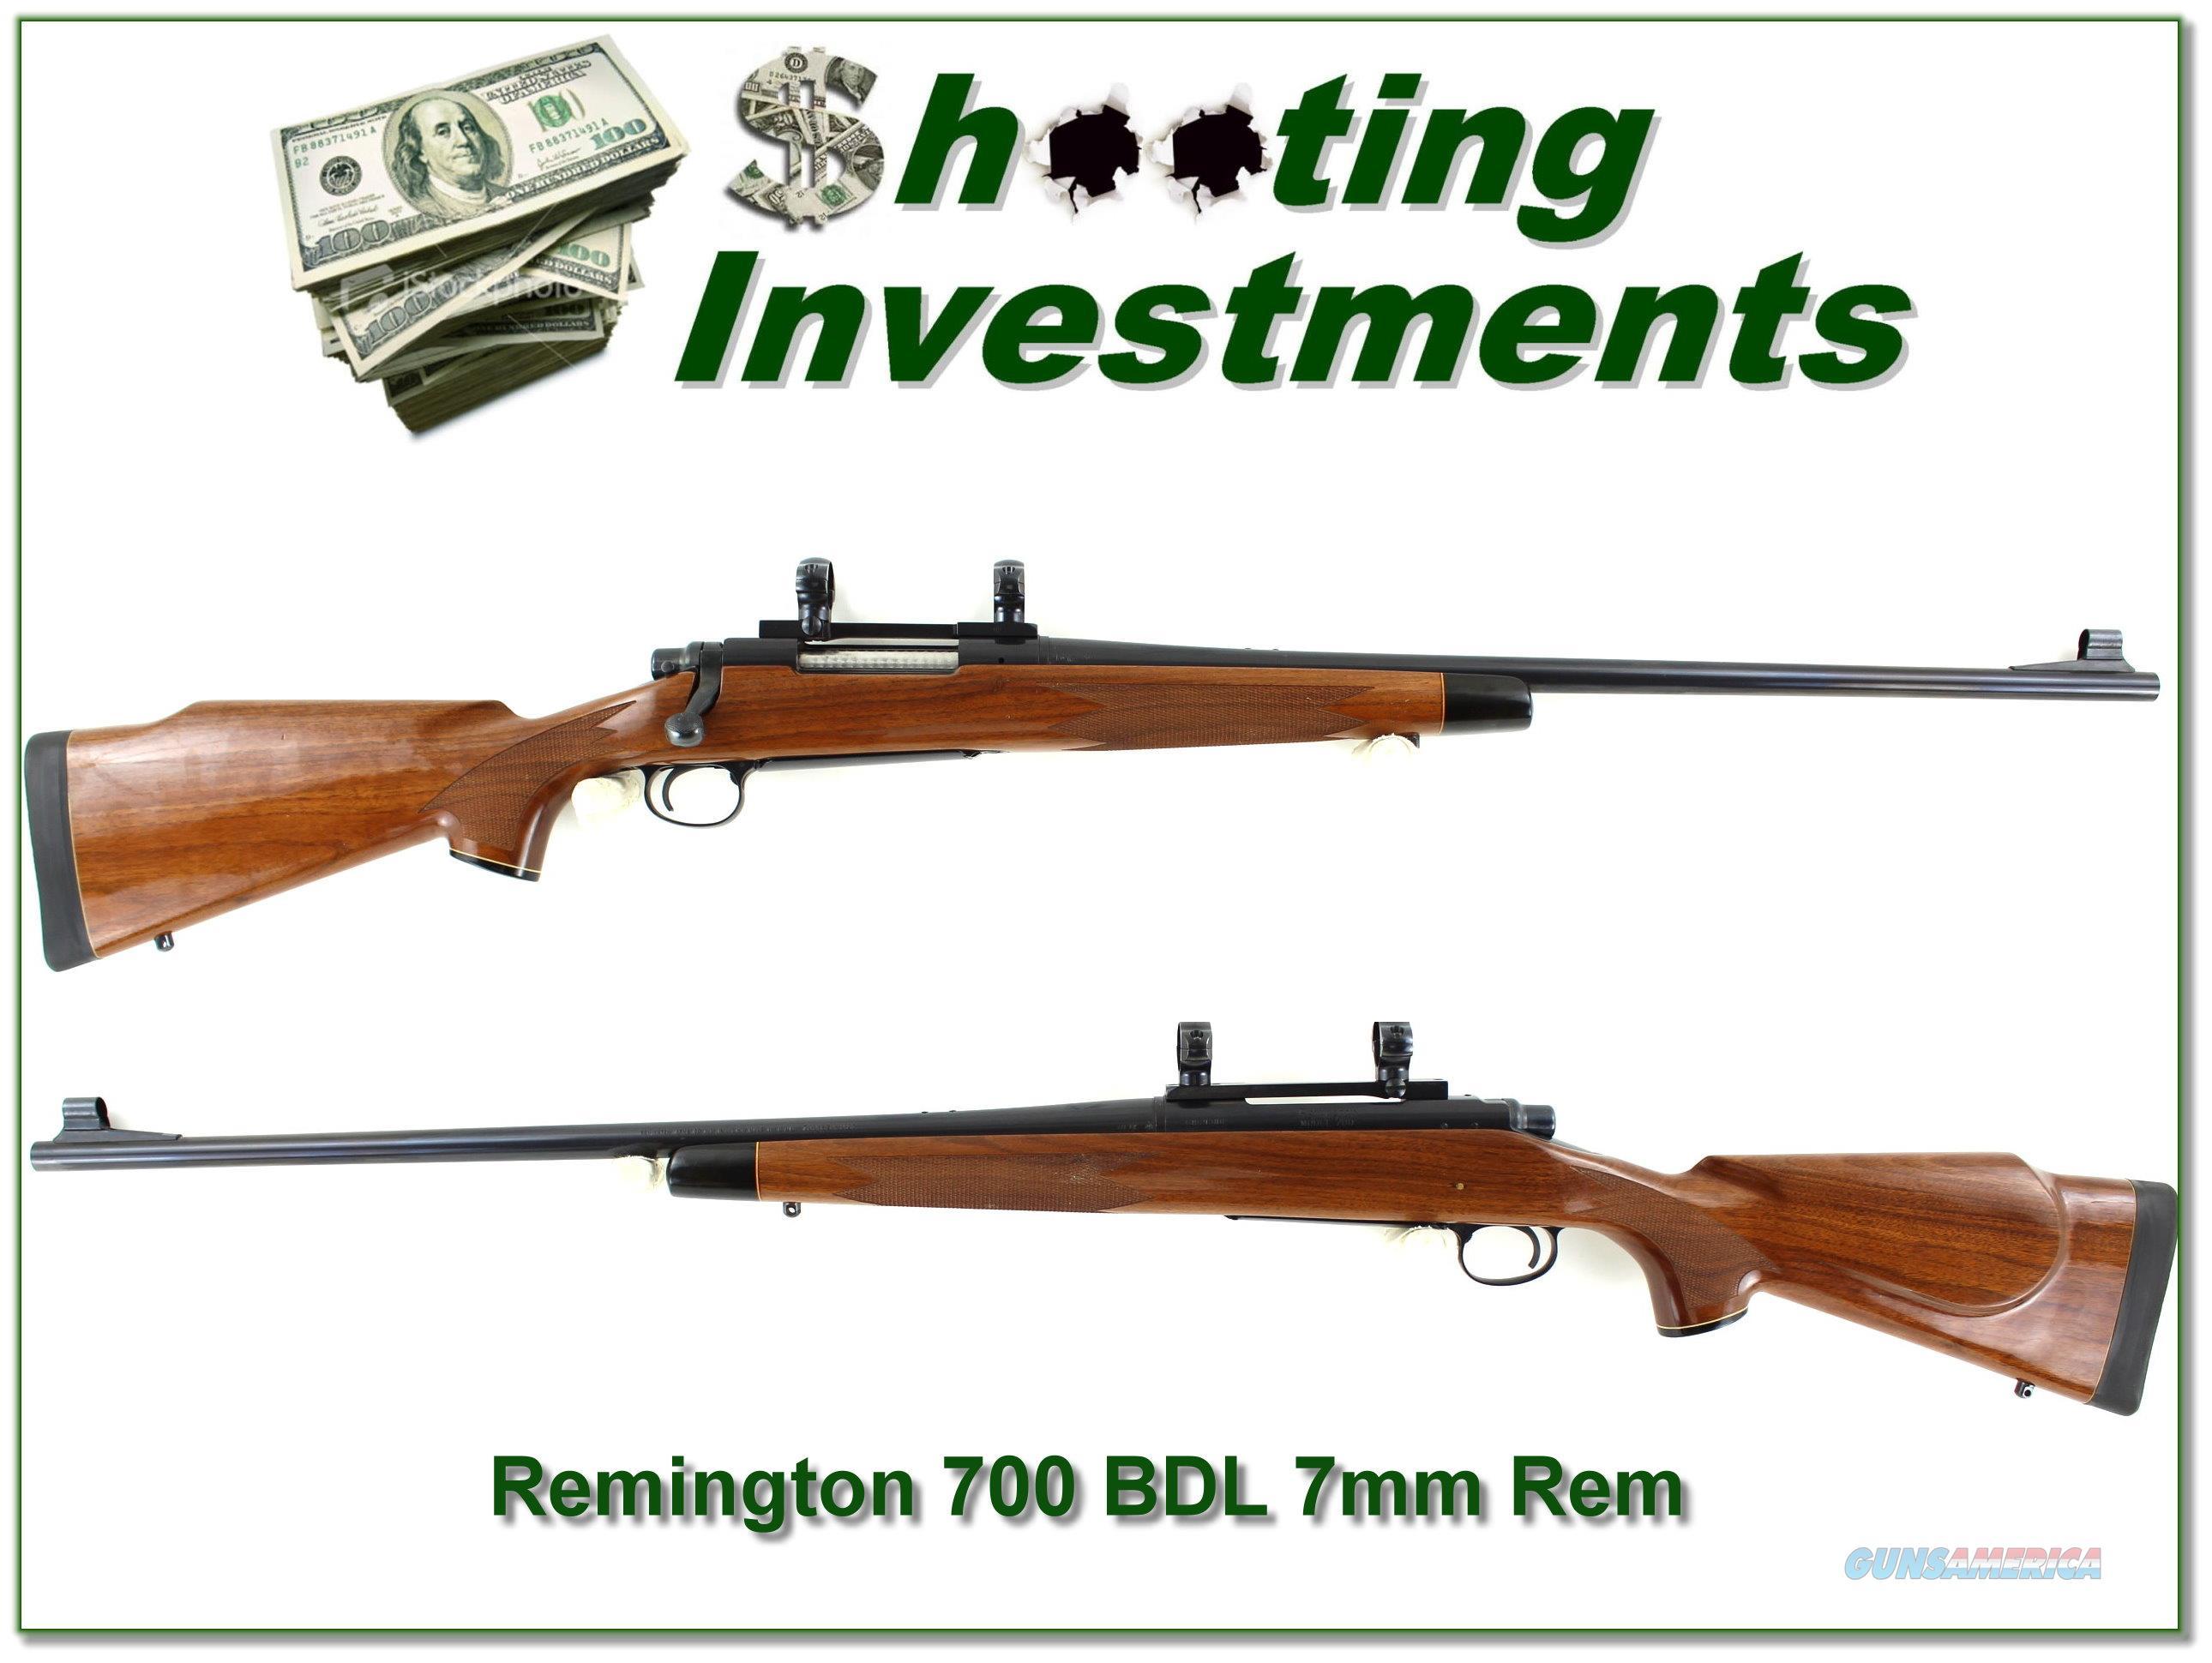 Remington 700 BDL earlier 7mm Rem Mag about new!  Guns > Rifles > Remington Rifles - Modern > Model 700 > Sporting